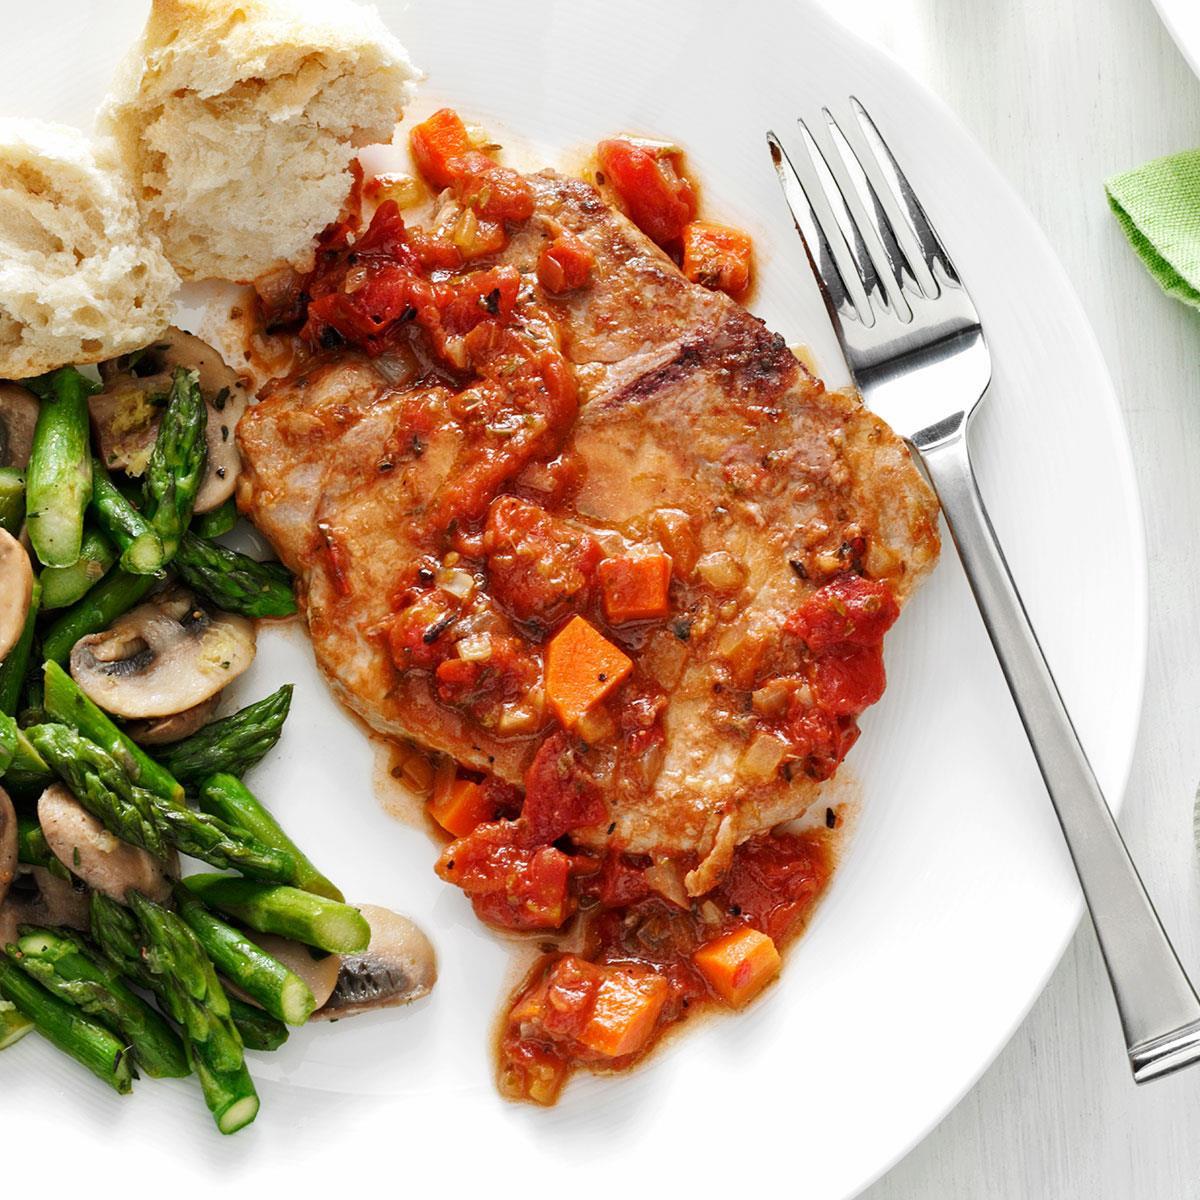 Heart Healthy Pork Chop Recipes  Tomato Topped Italian Pork Chops